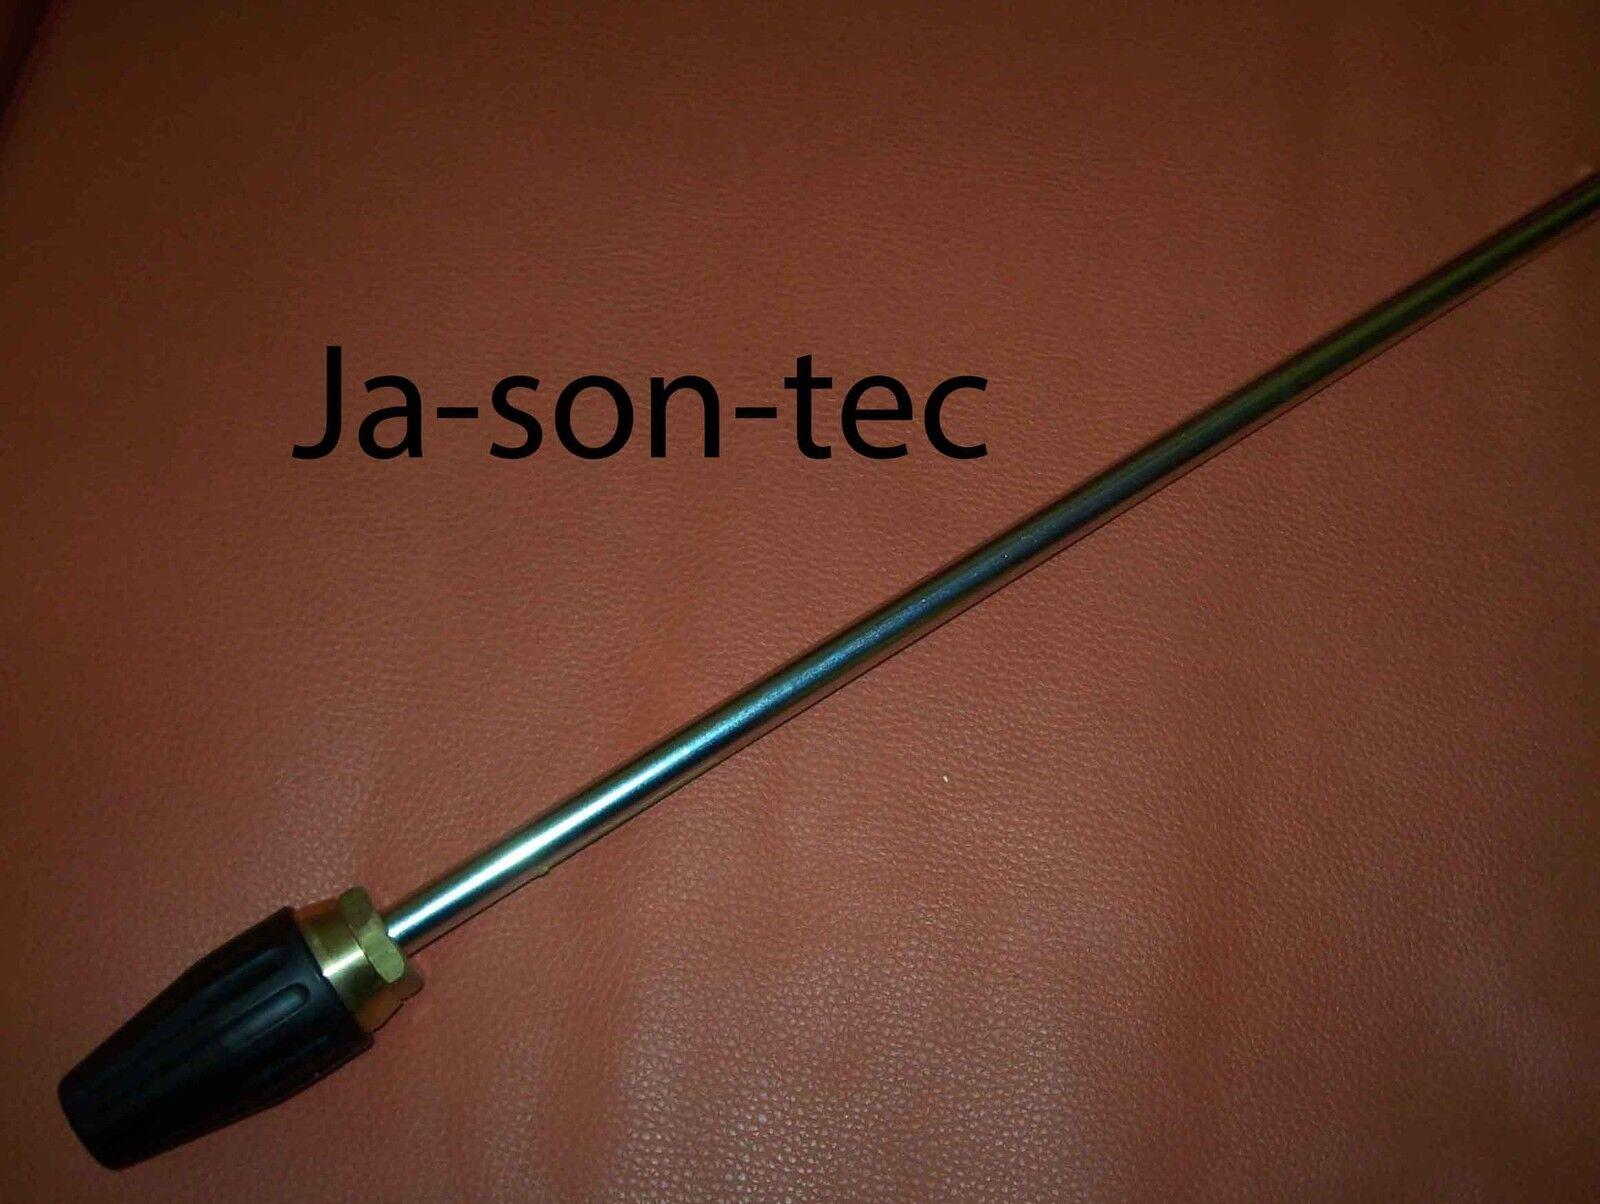 Fräse Turbokiller für Kränzle 1150T 1151T 1152T  10/120 160 TST  Mit Lanze